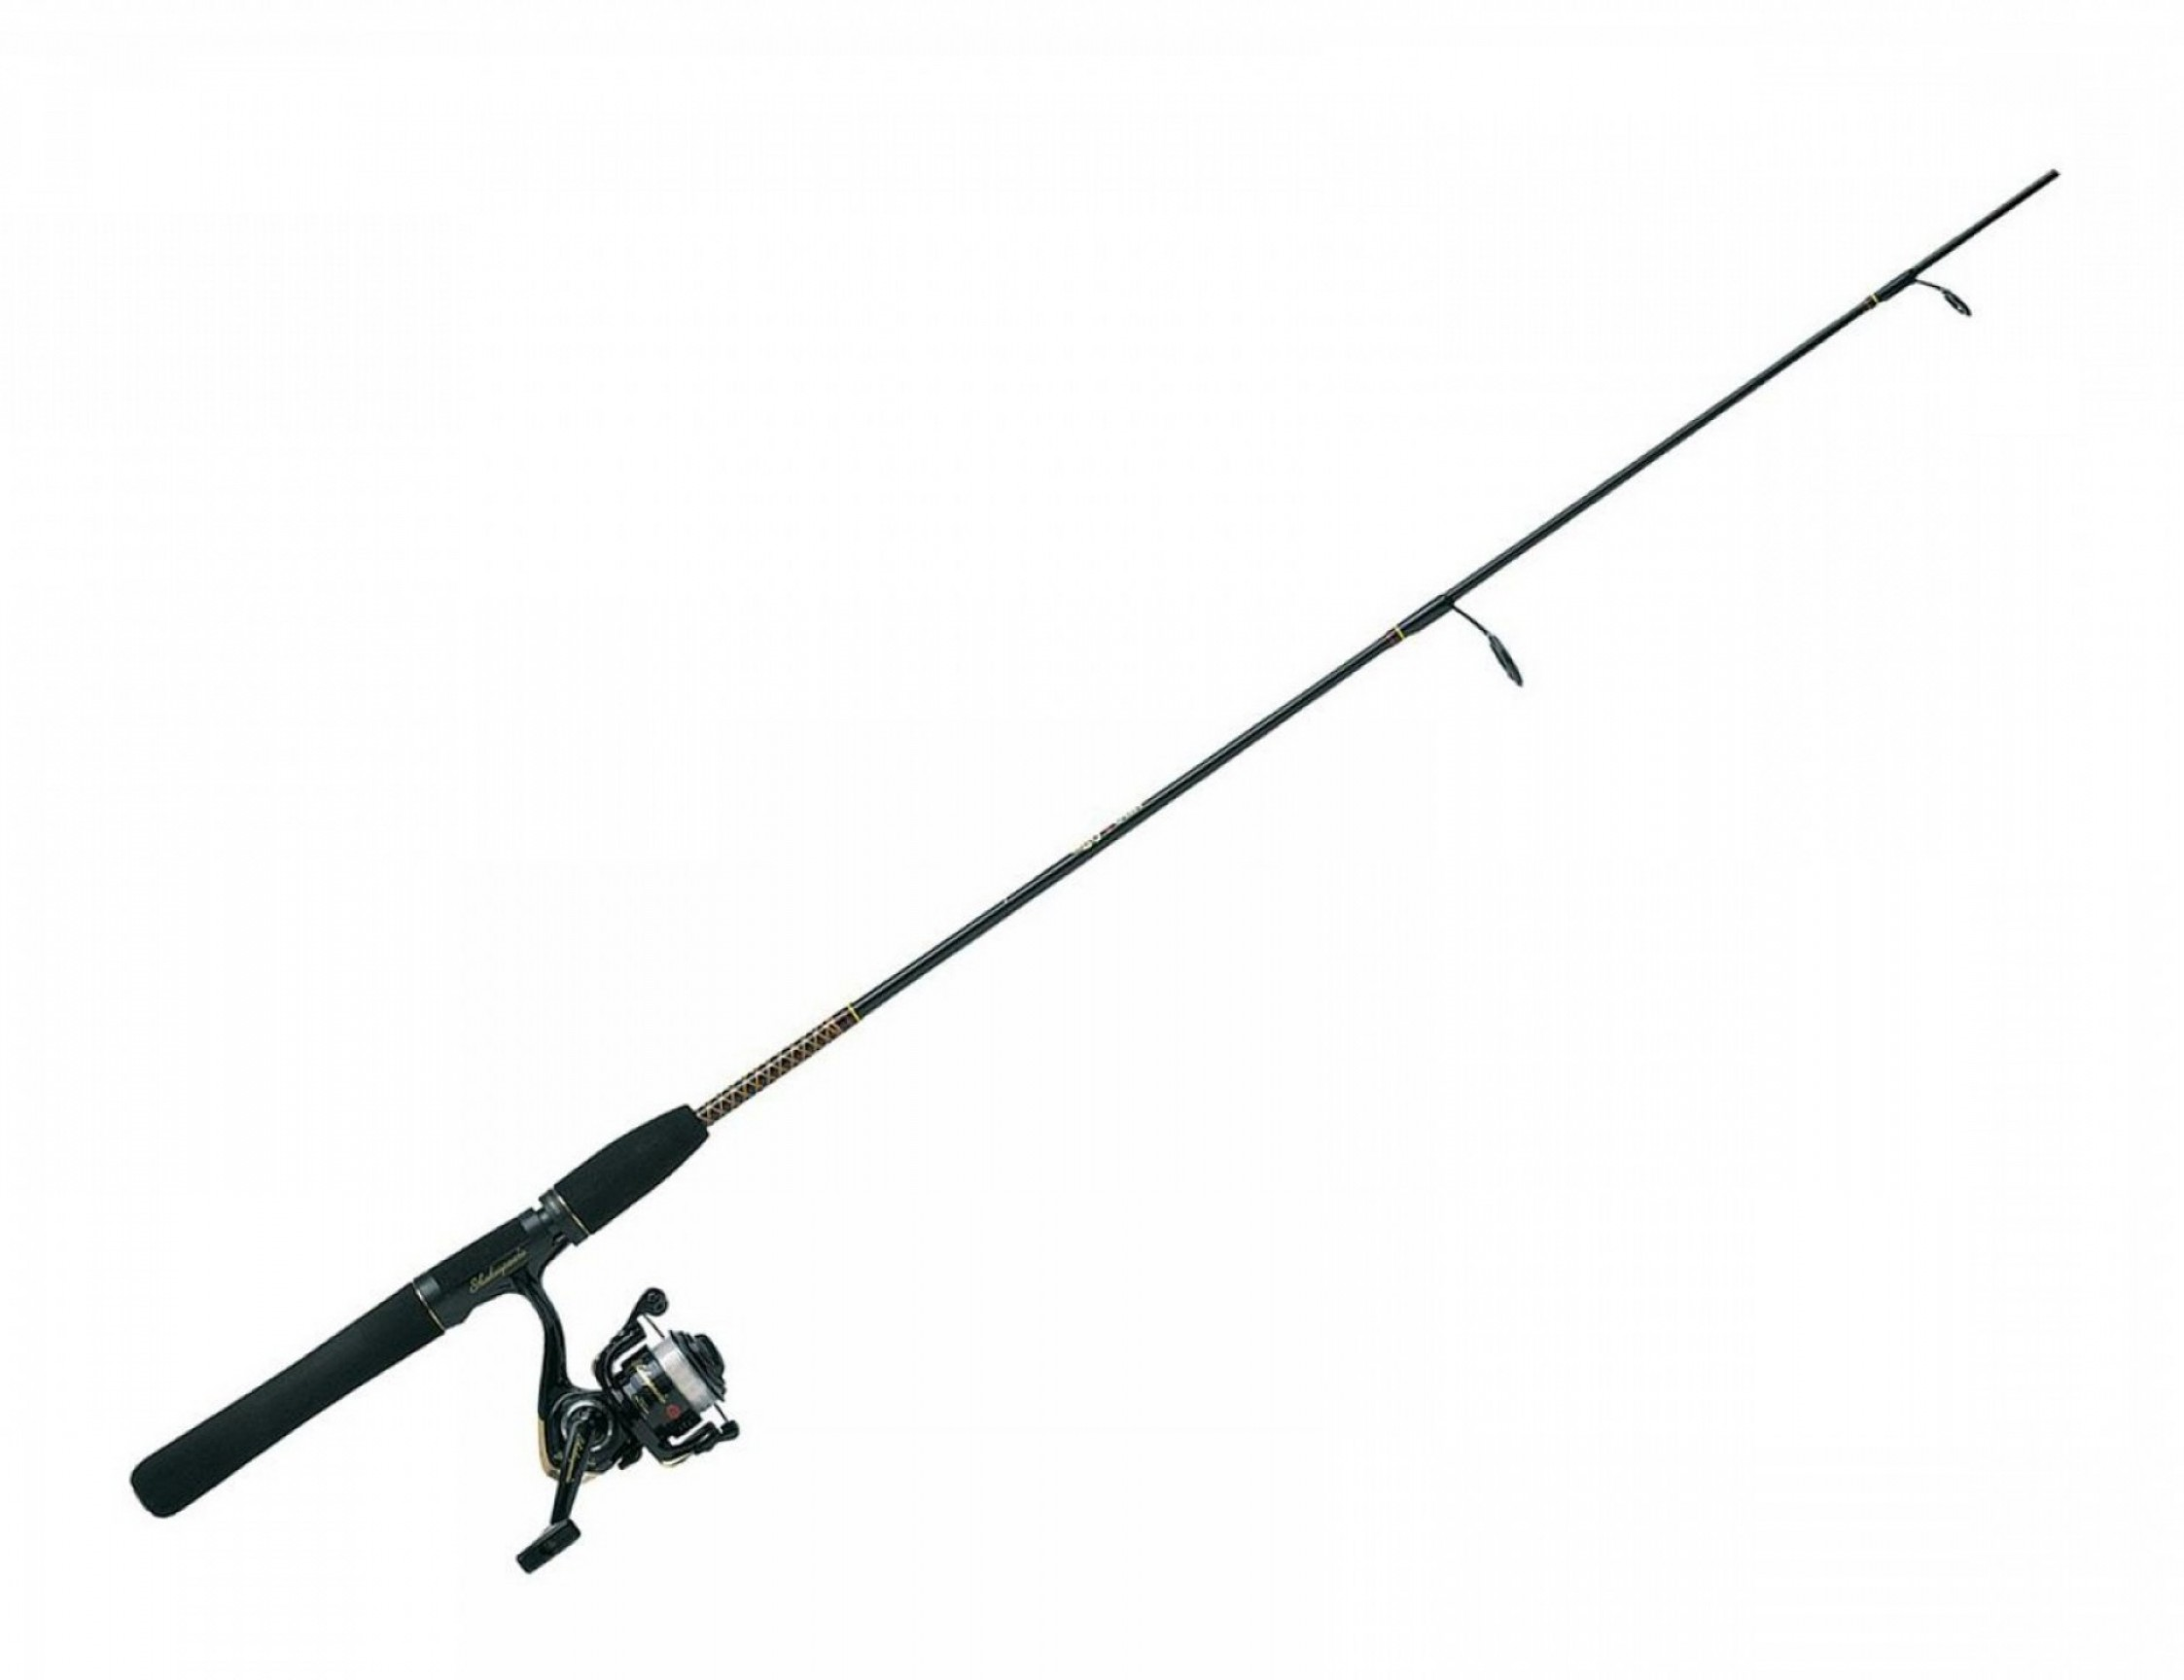 Best Fishing Pole Rod Clipart Kiaavto Image Images.